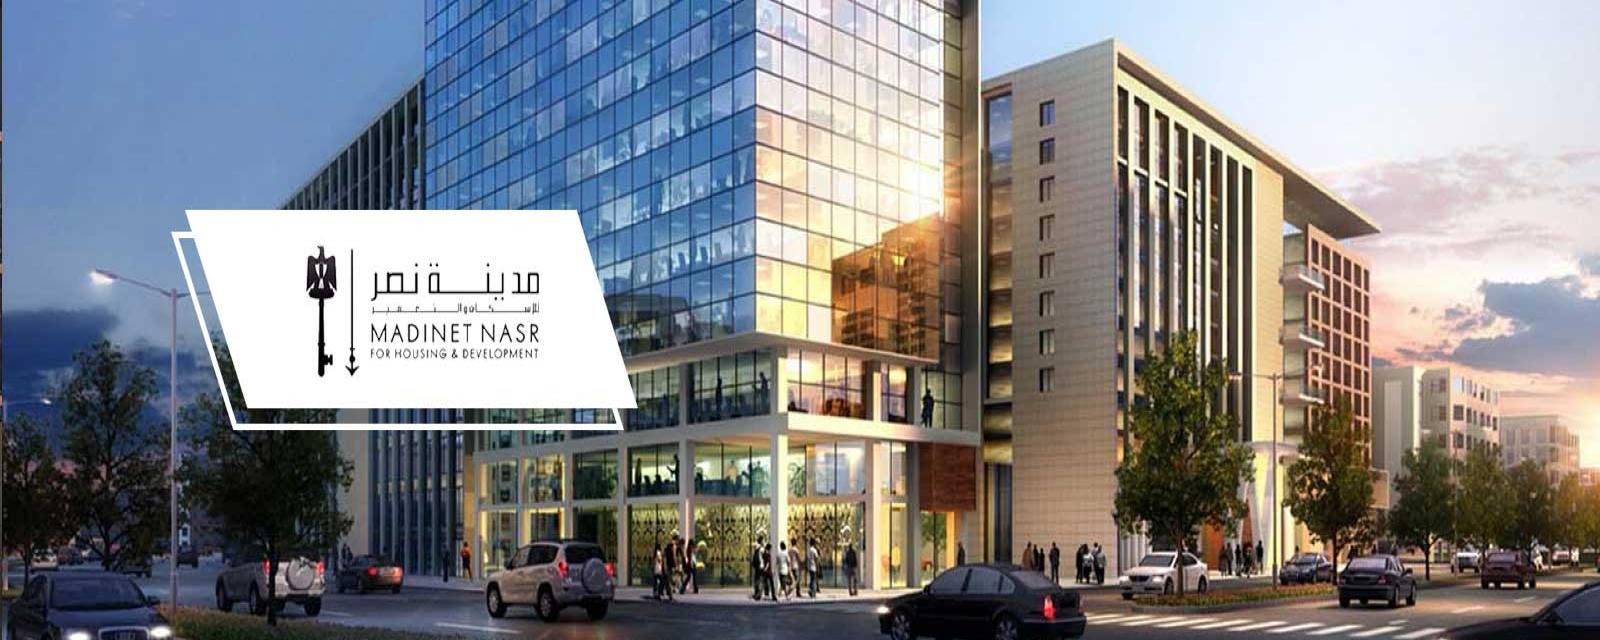 Madinet Nasr Housing & Development  Coverphoto Flash Property